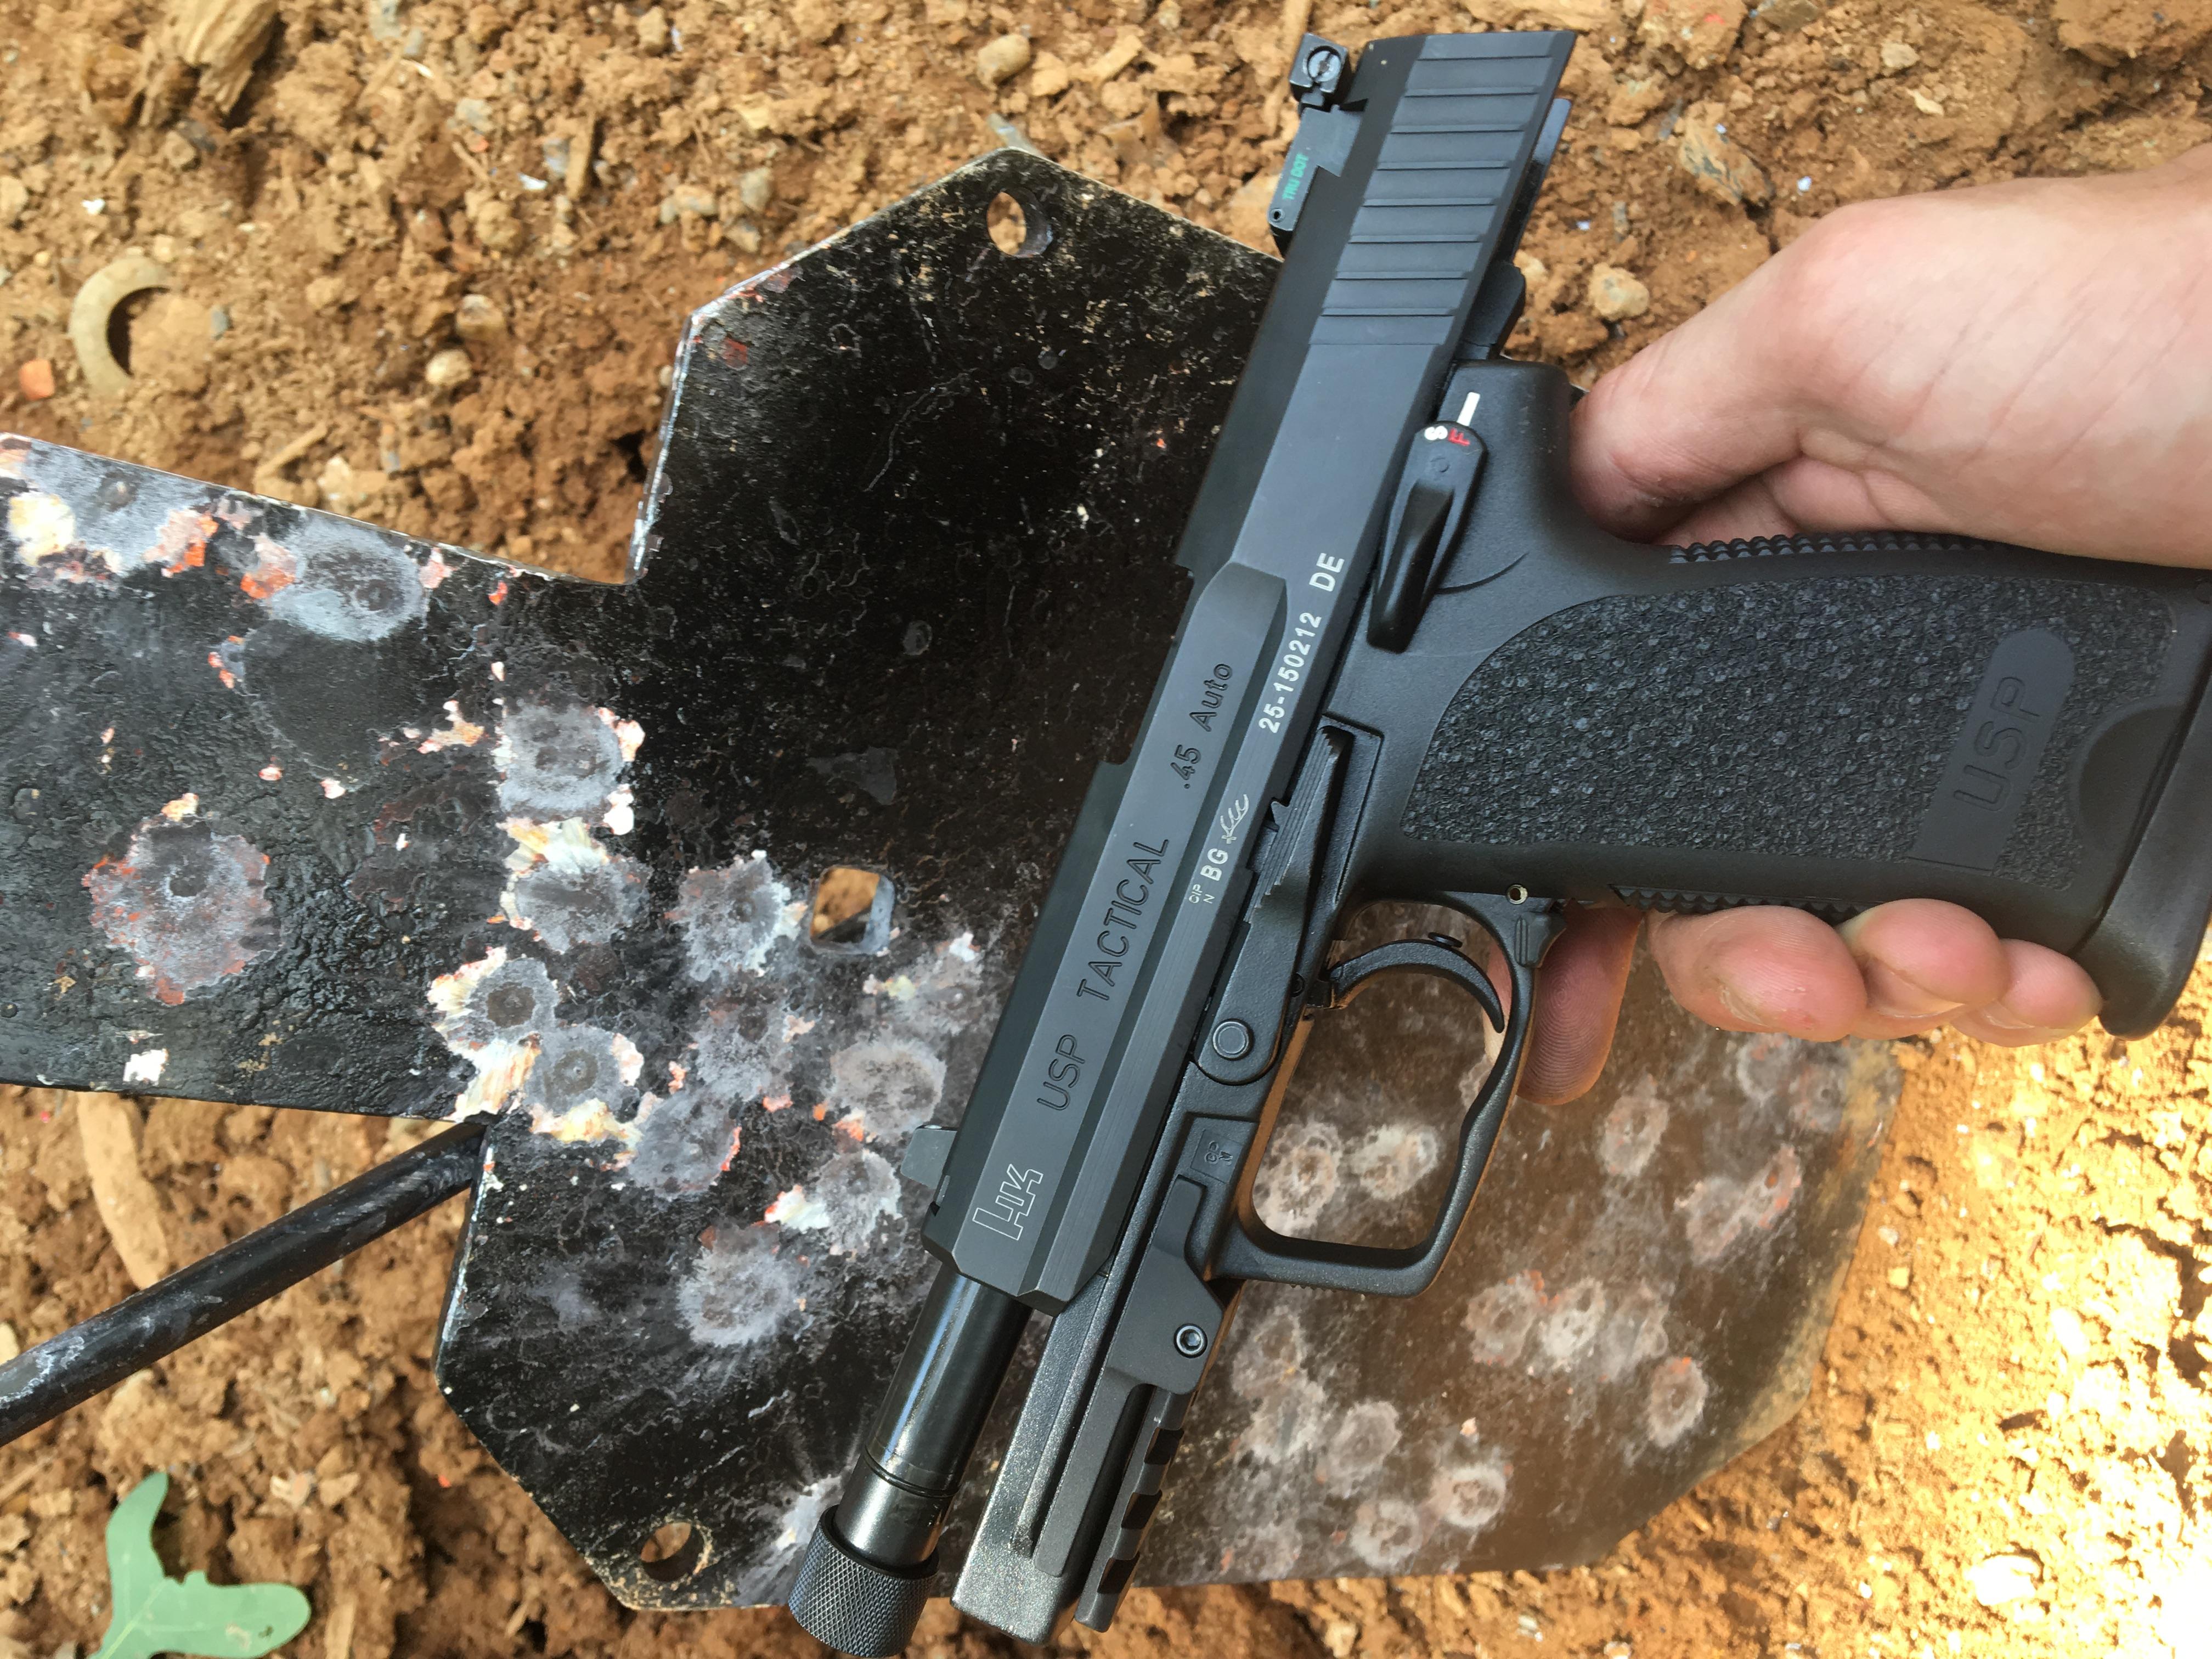 USP 45 Tactical: Showing Her Off-fb1e4c19-85d6-4227-afce-906e1d6d8947.jpeg